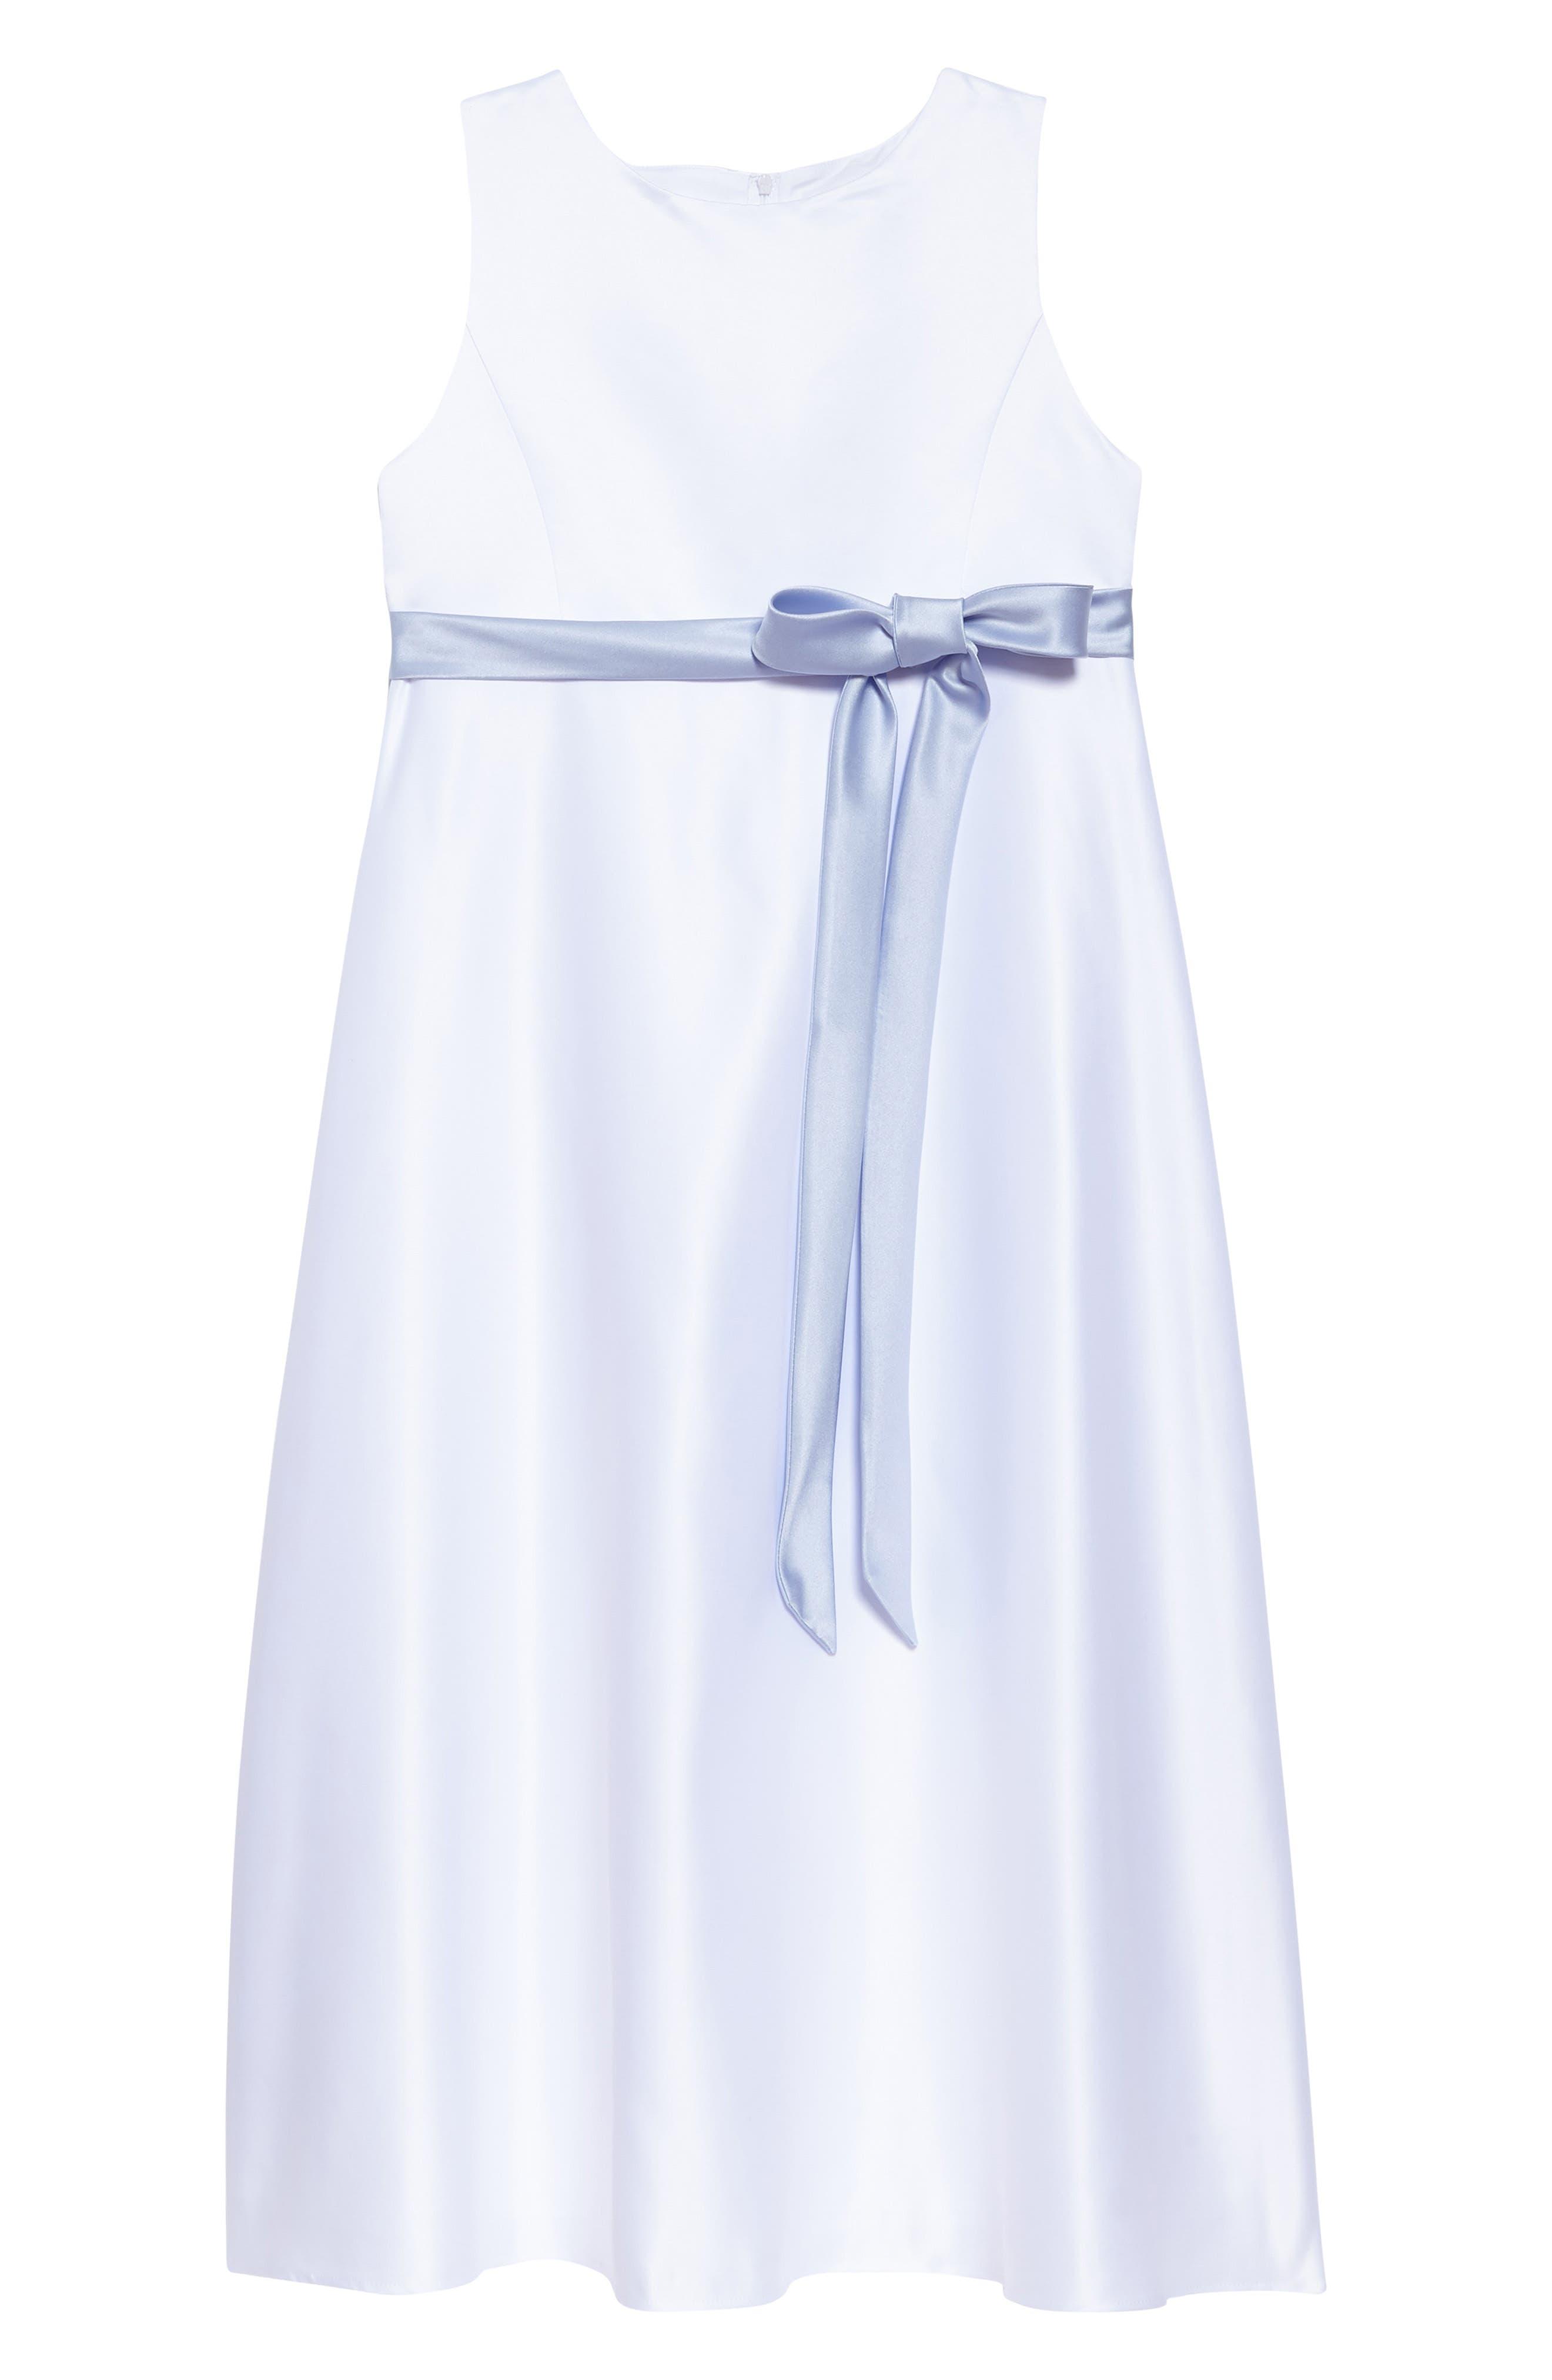 Sleeveless Satin Dress,                             Main thumbnail 1, color,                             WHITE/ BLUE